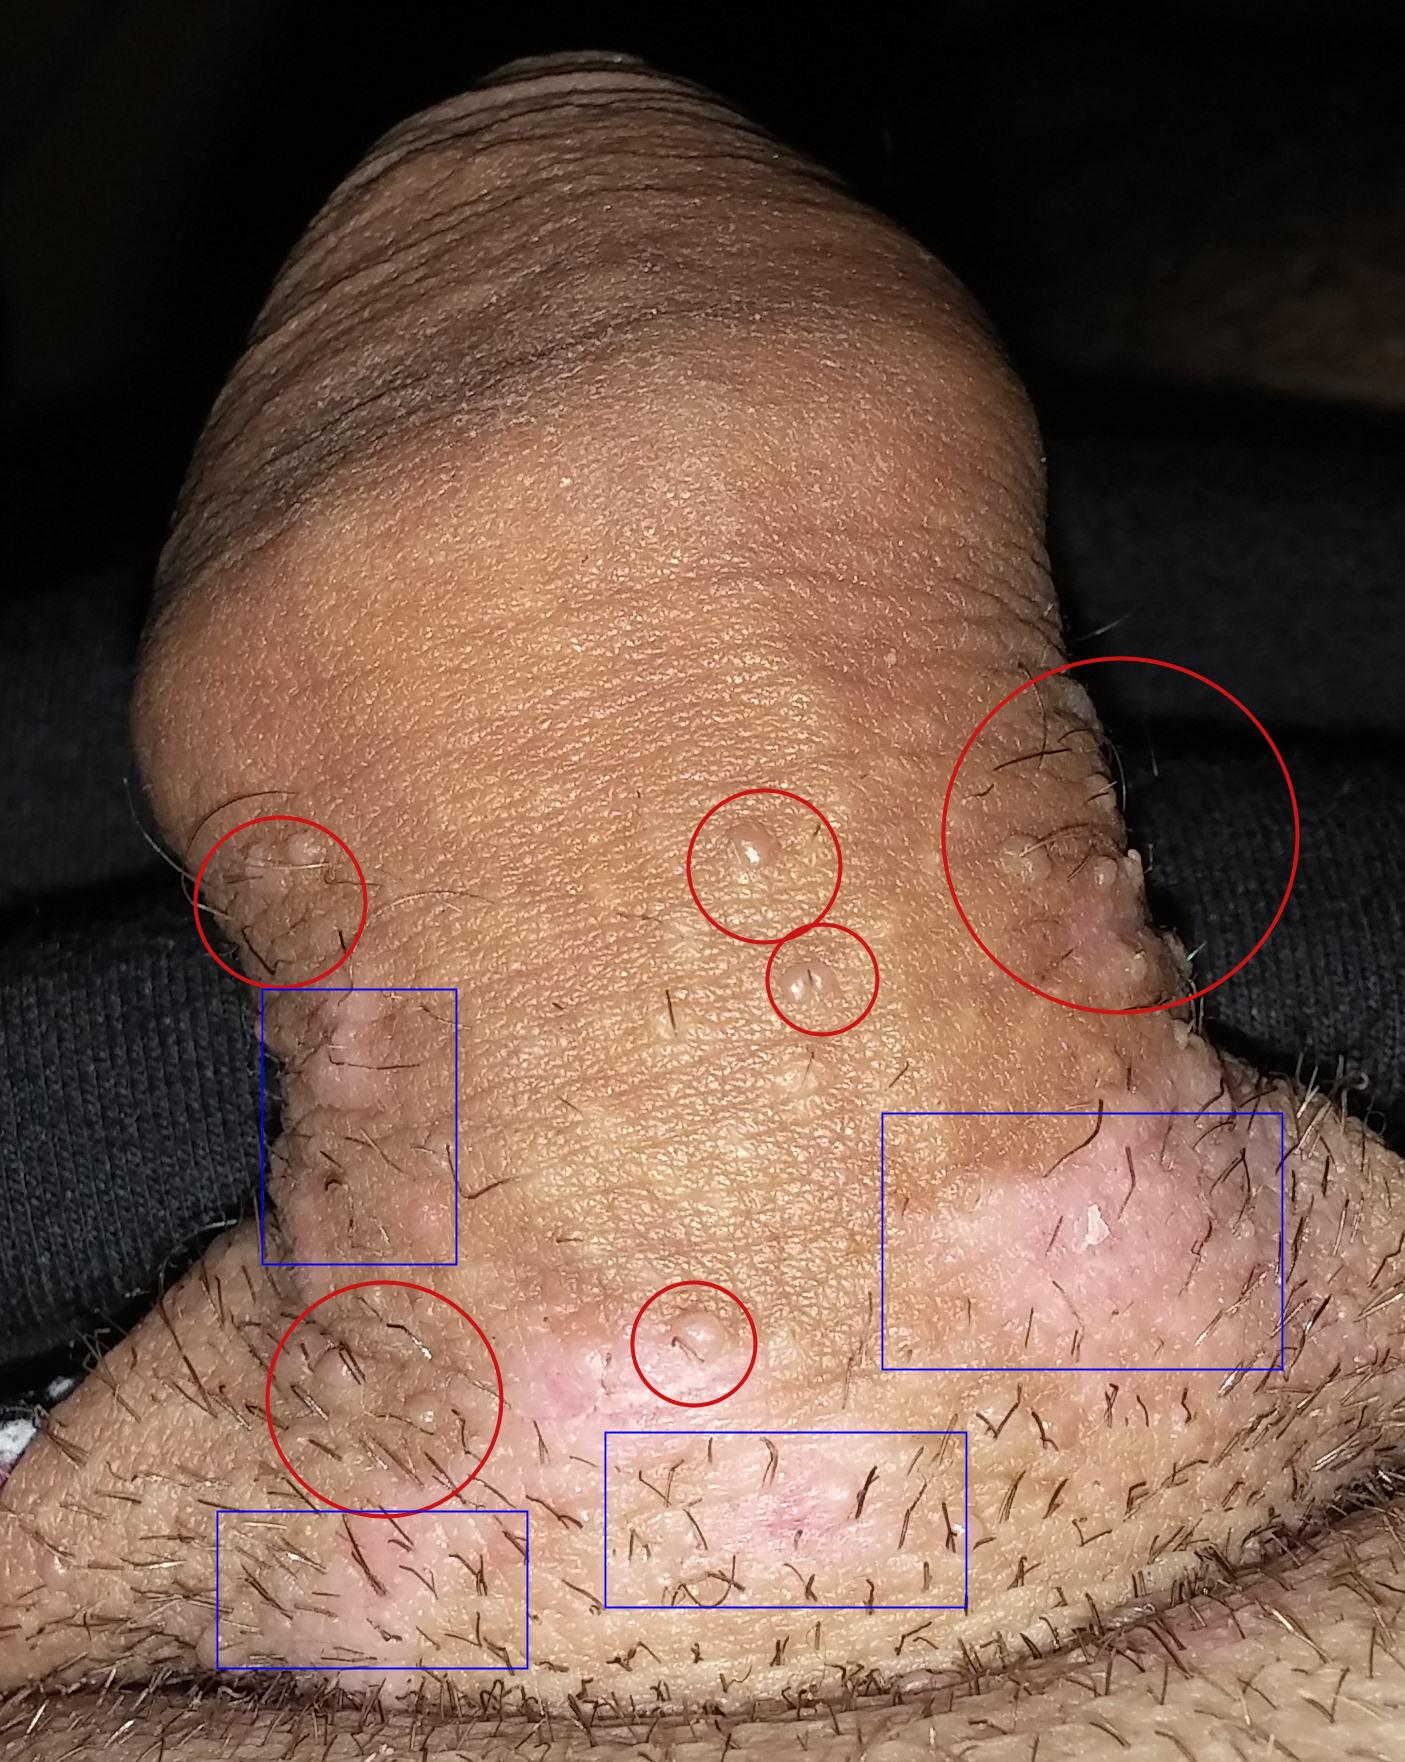 hpv femme symptomes